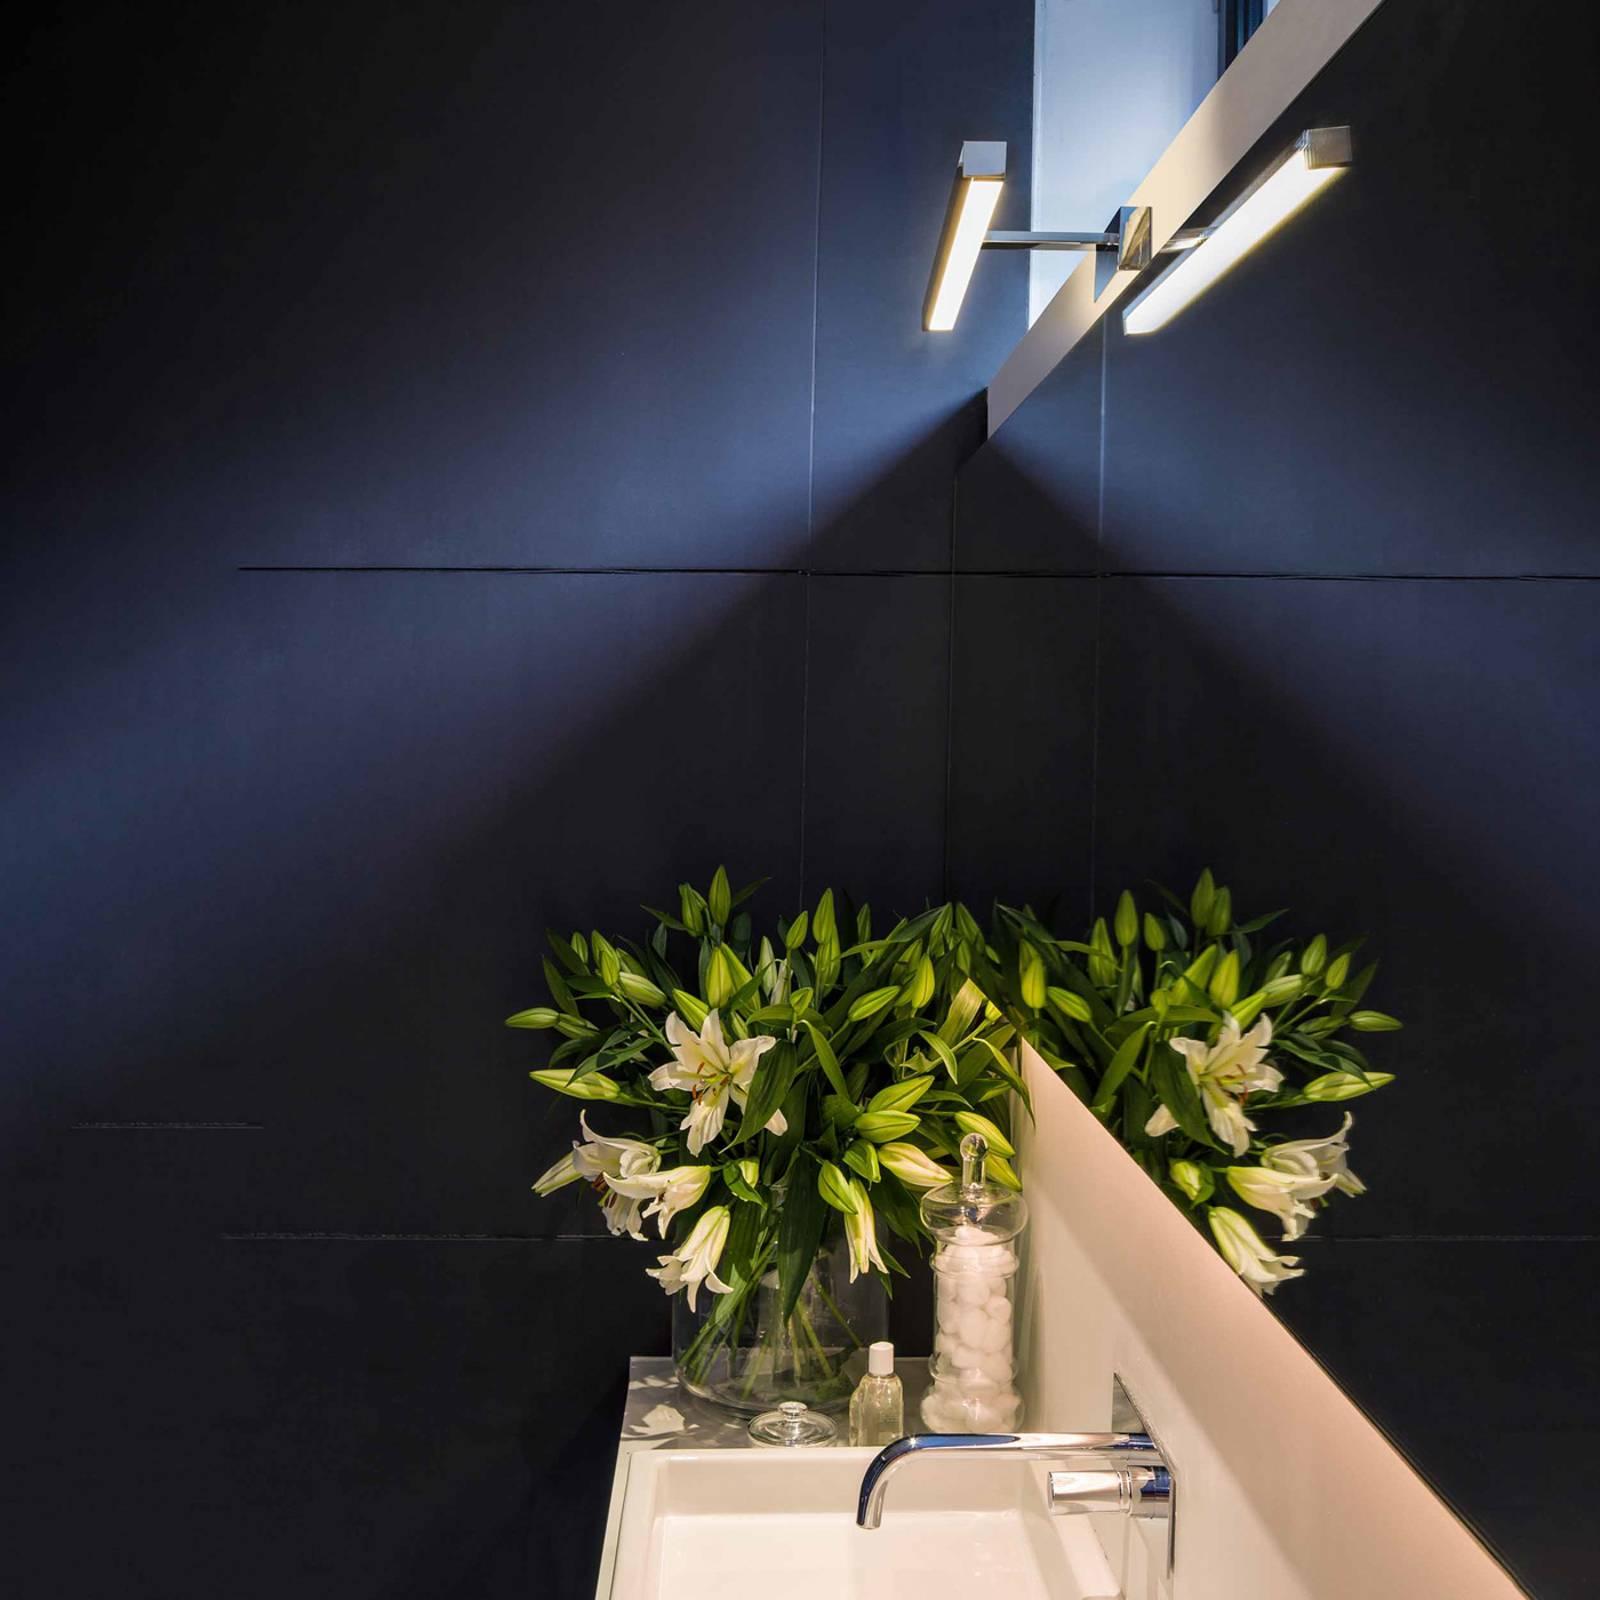 Astro Kashima 620 -LED-peililamppu, kromi, 62 cm